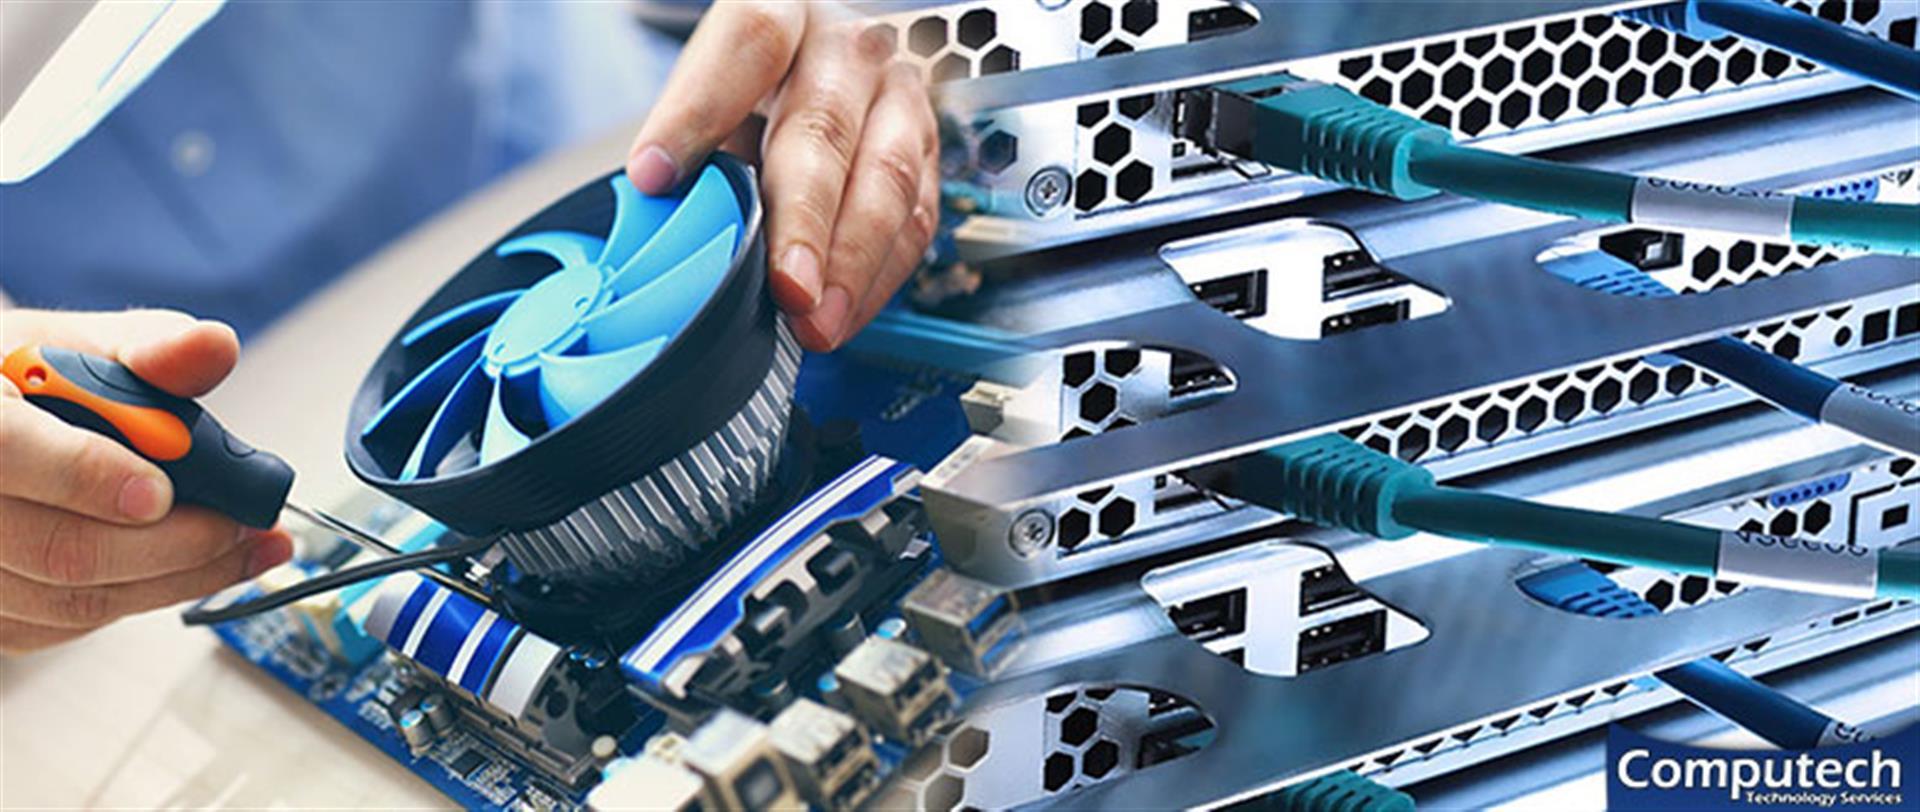 Culpeper Virginia Onsite Computer PC & Printer Repair, Networking, Voice & Data Cabling Solutions